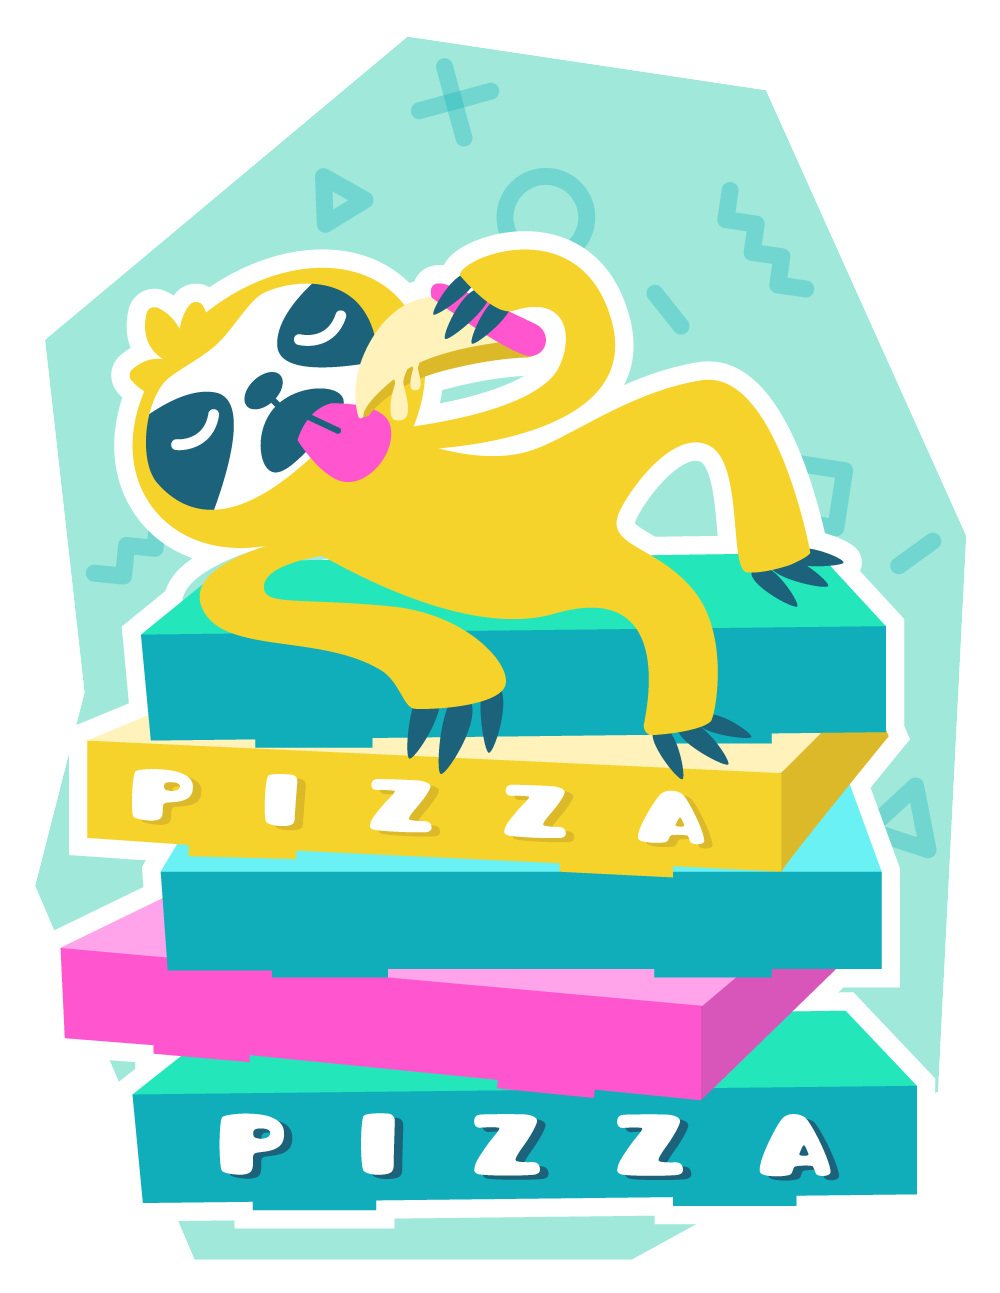 pizzasloth.png